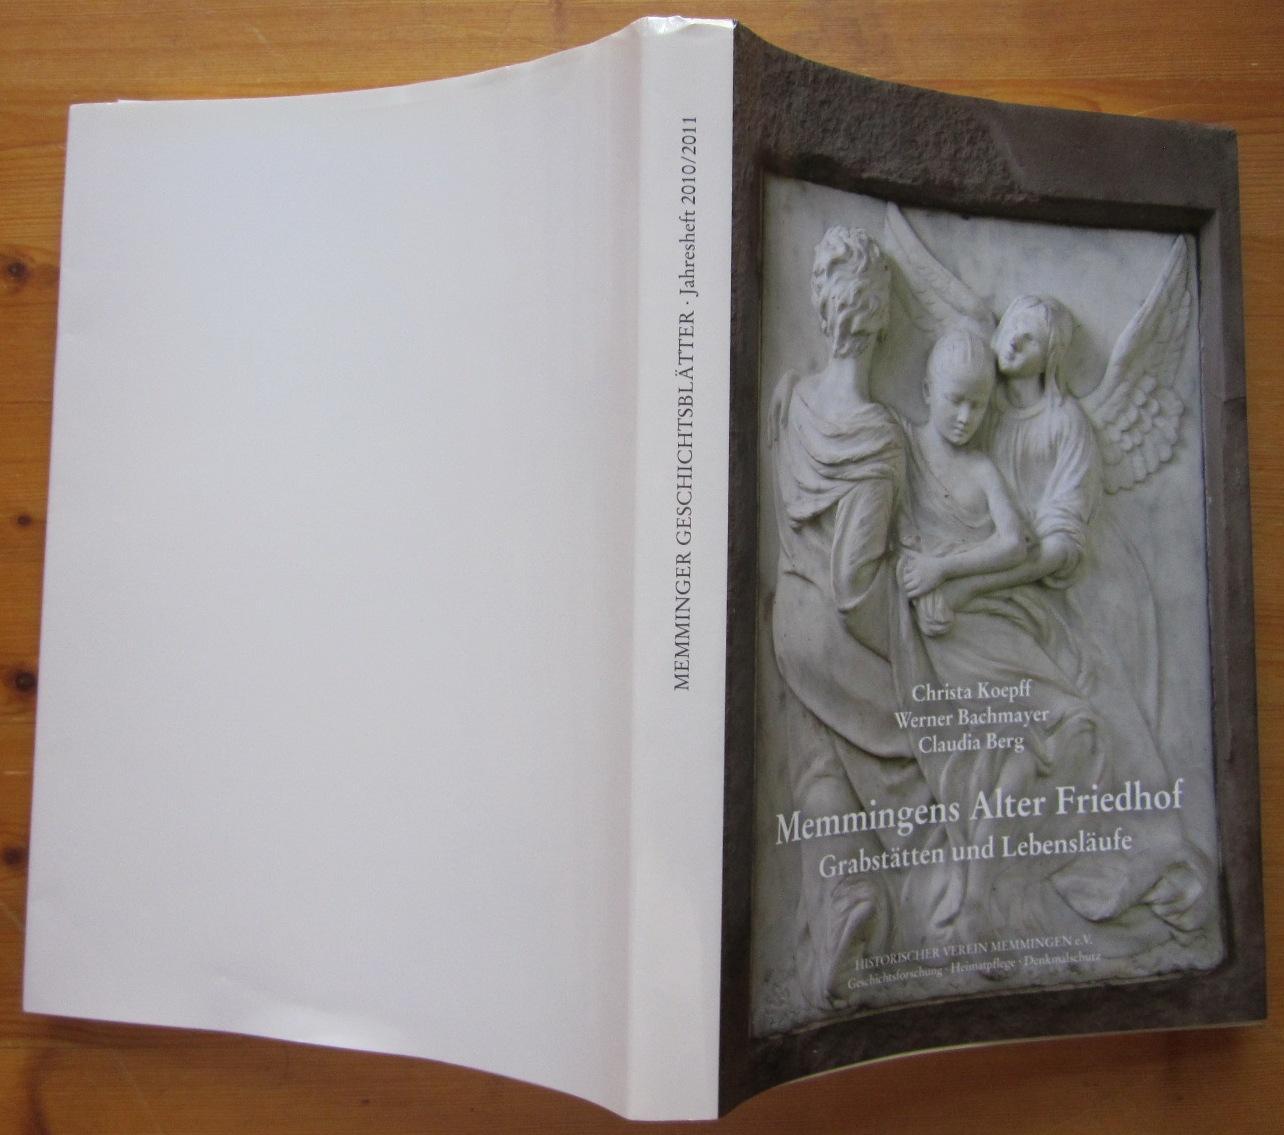 Memmingens Alter Friedhof. Grabstätten und Lebensläufe.: Memminger Geschichtsblätter 2010/2011.-